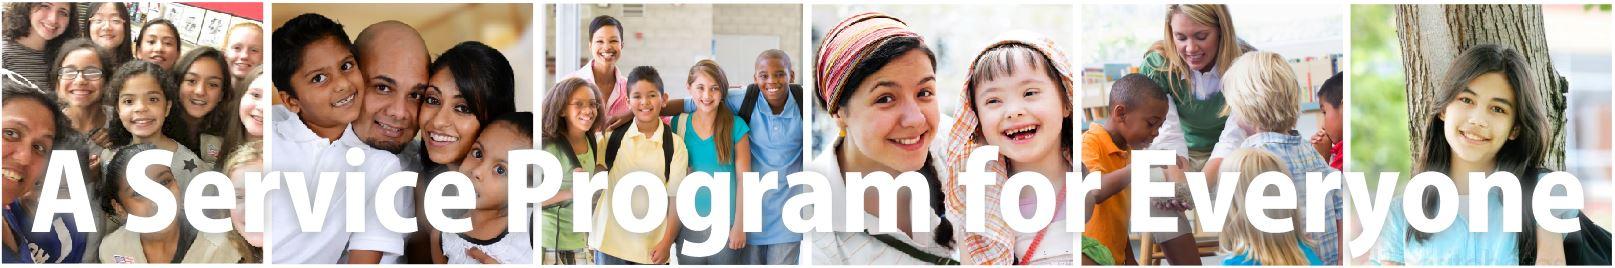 Community Service Program for Everyone